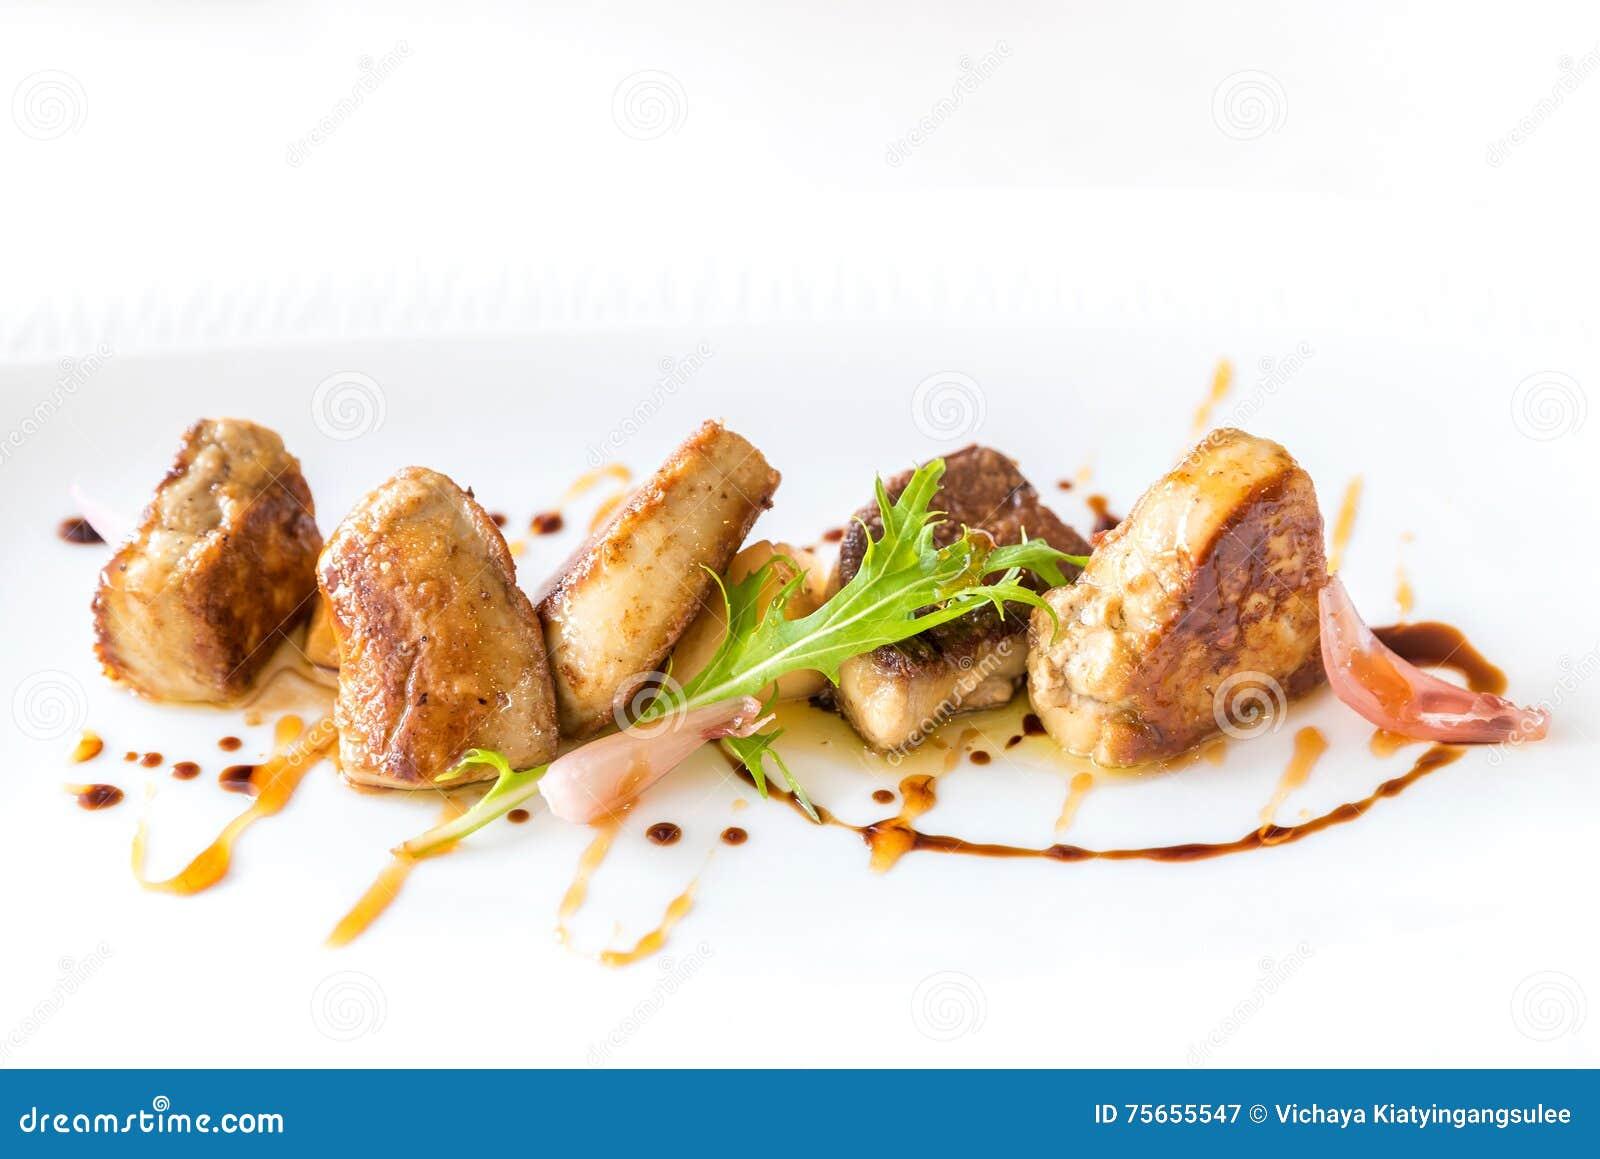 Foie gras som grillas